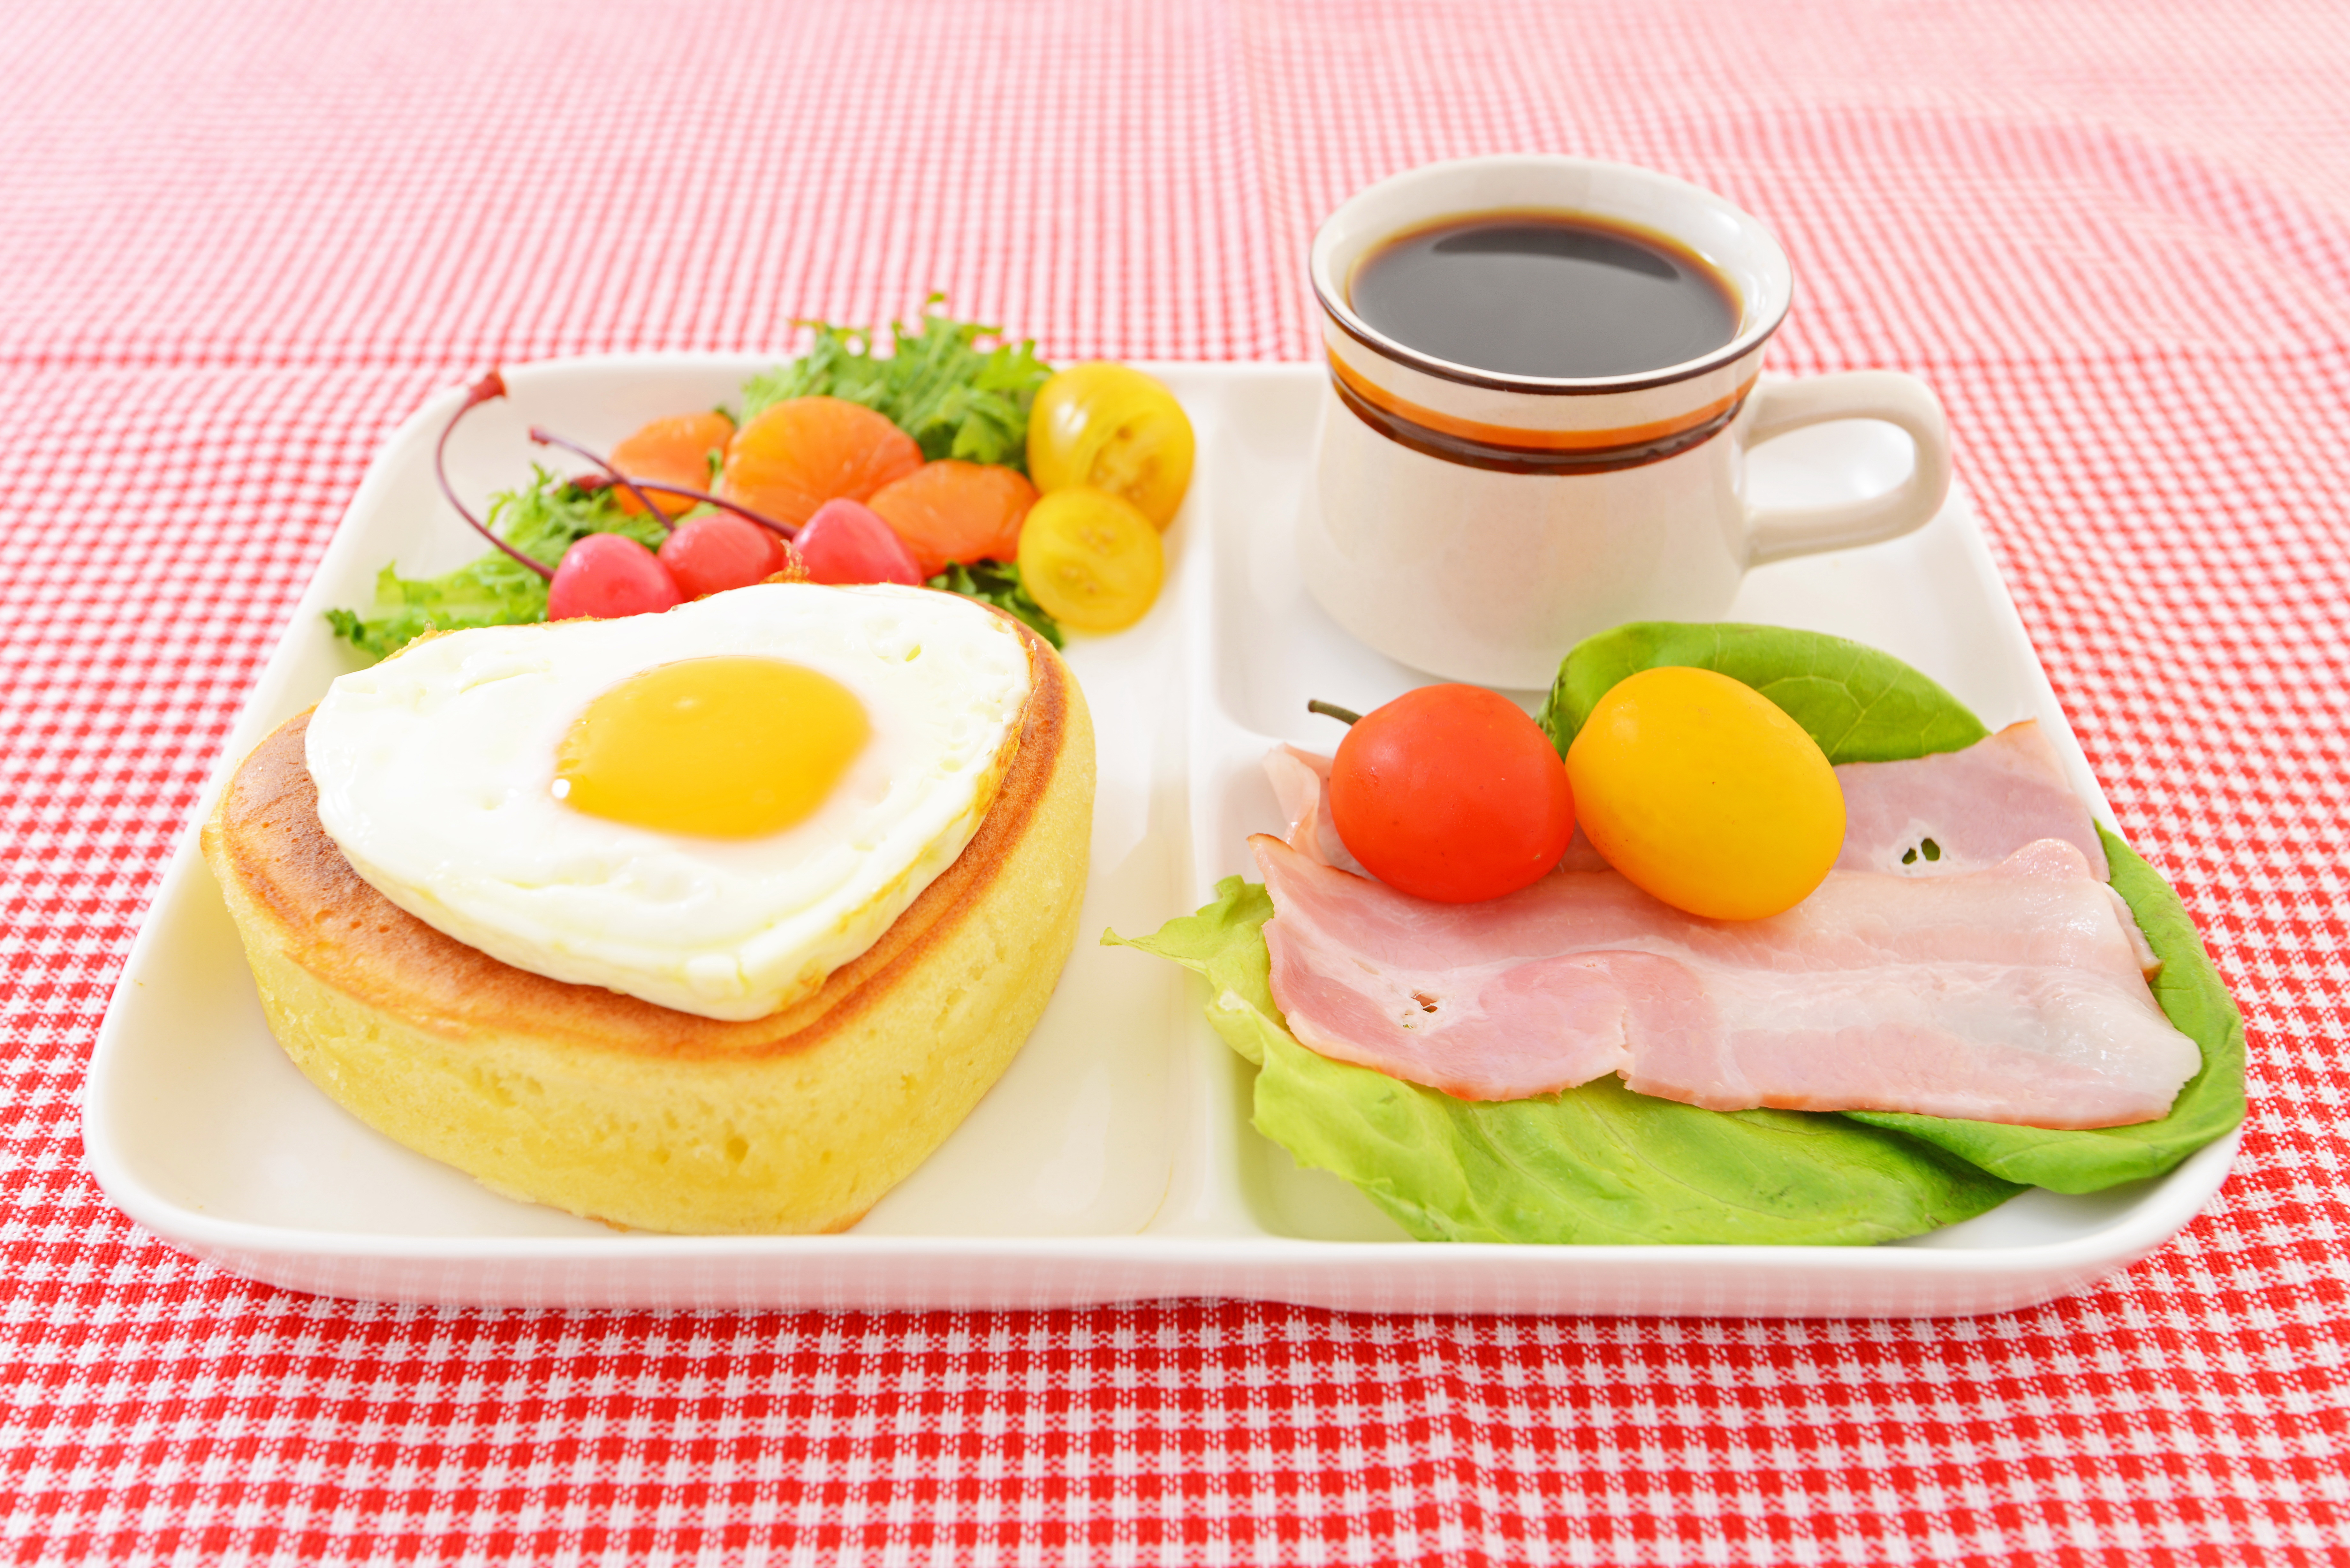 еда сок круасаны яйцо фрукты салат food juice croissants egg fruit salad без смс